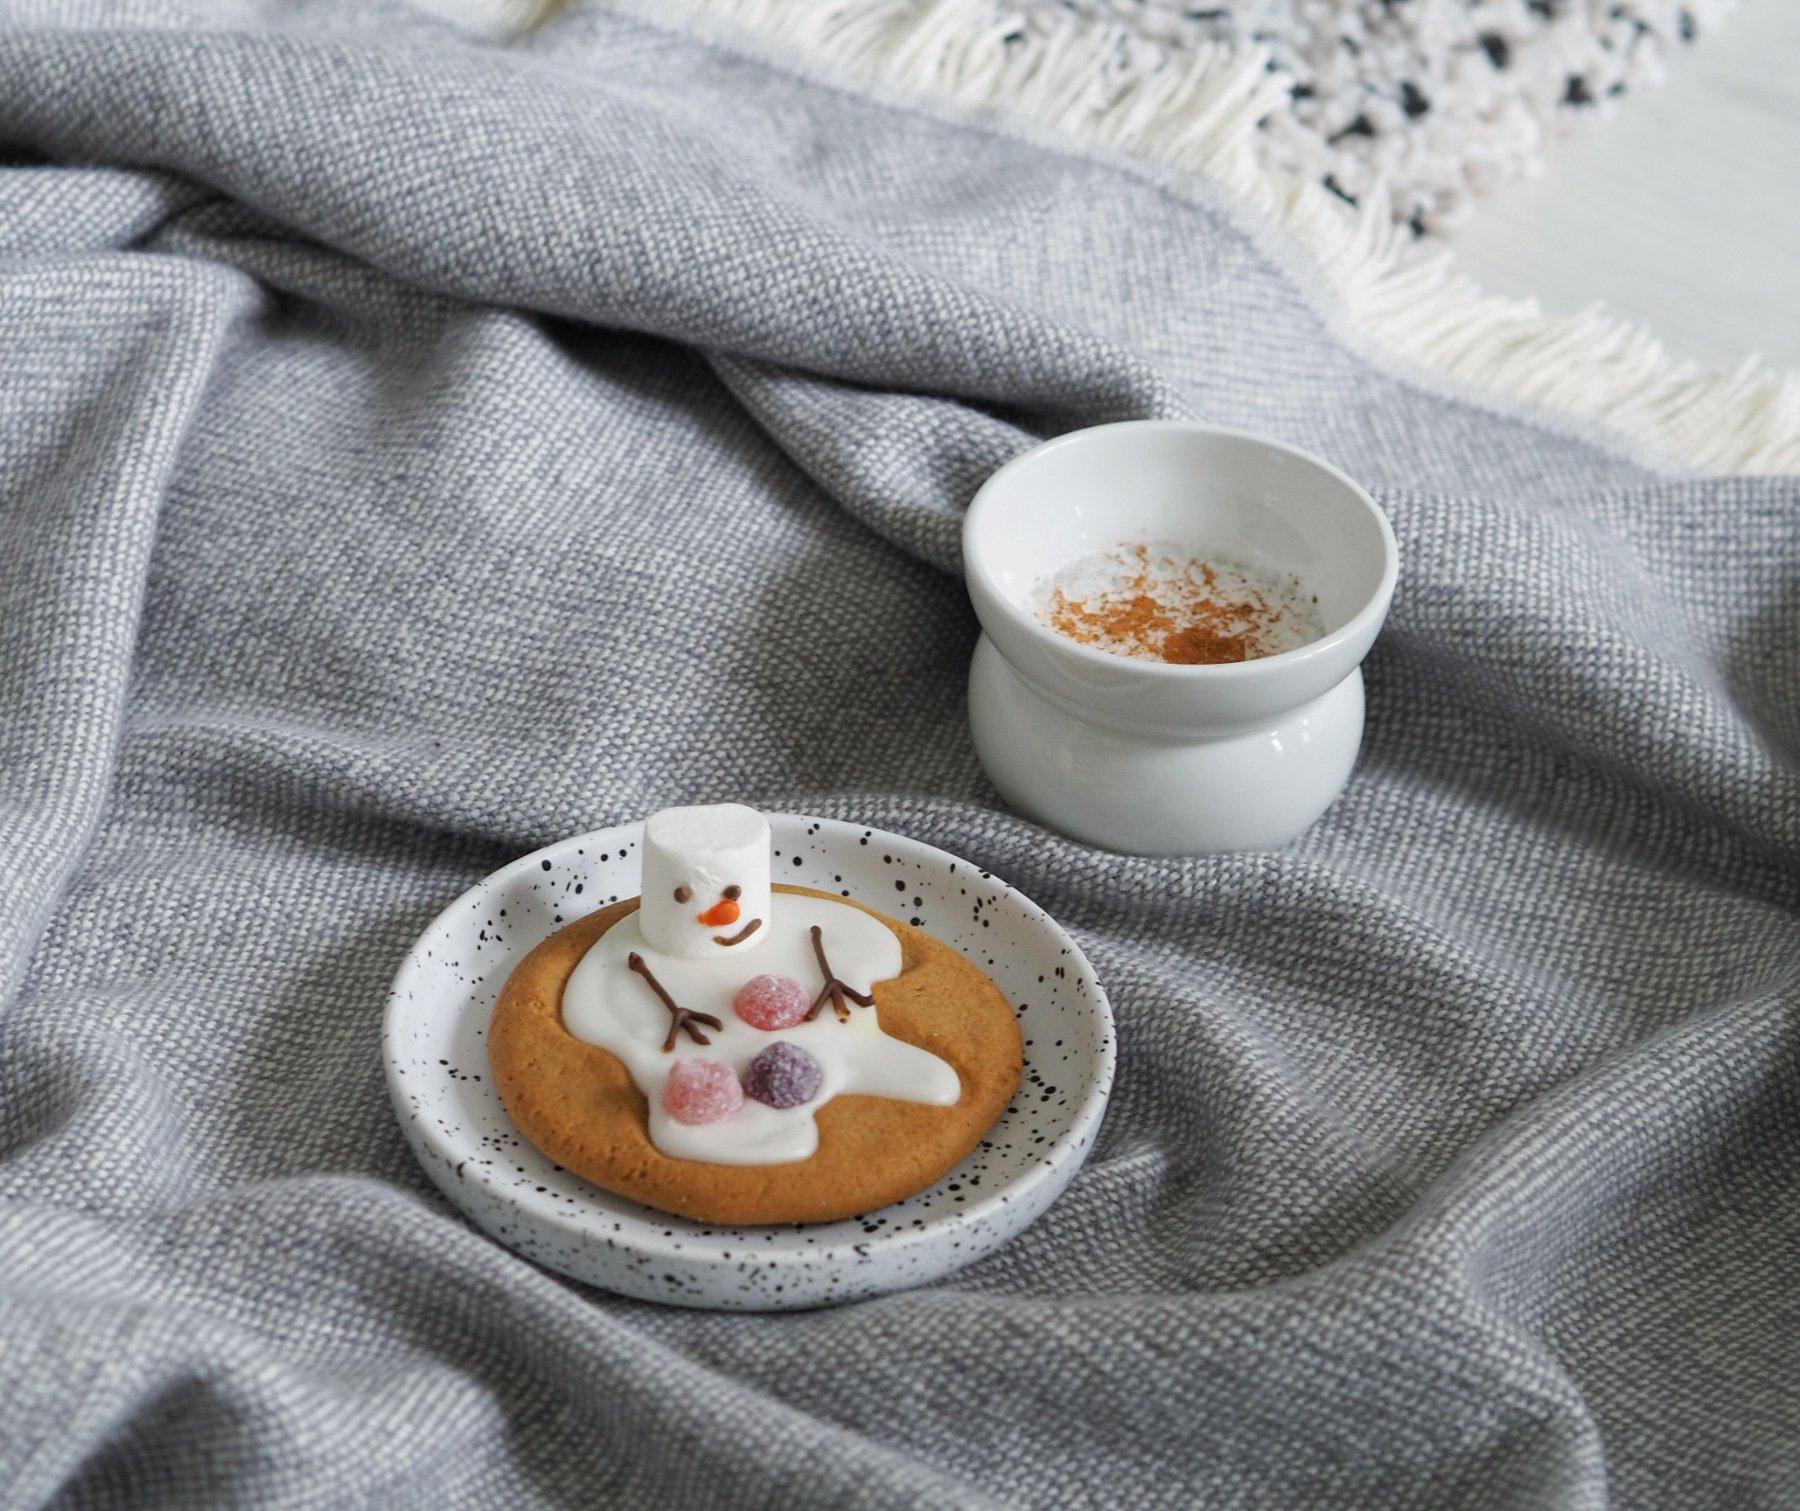 emracing winter scandinavian lifestyle